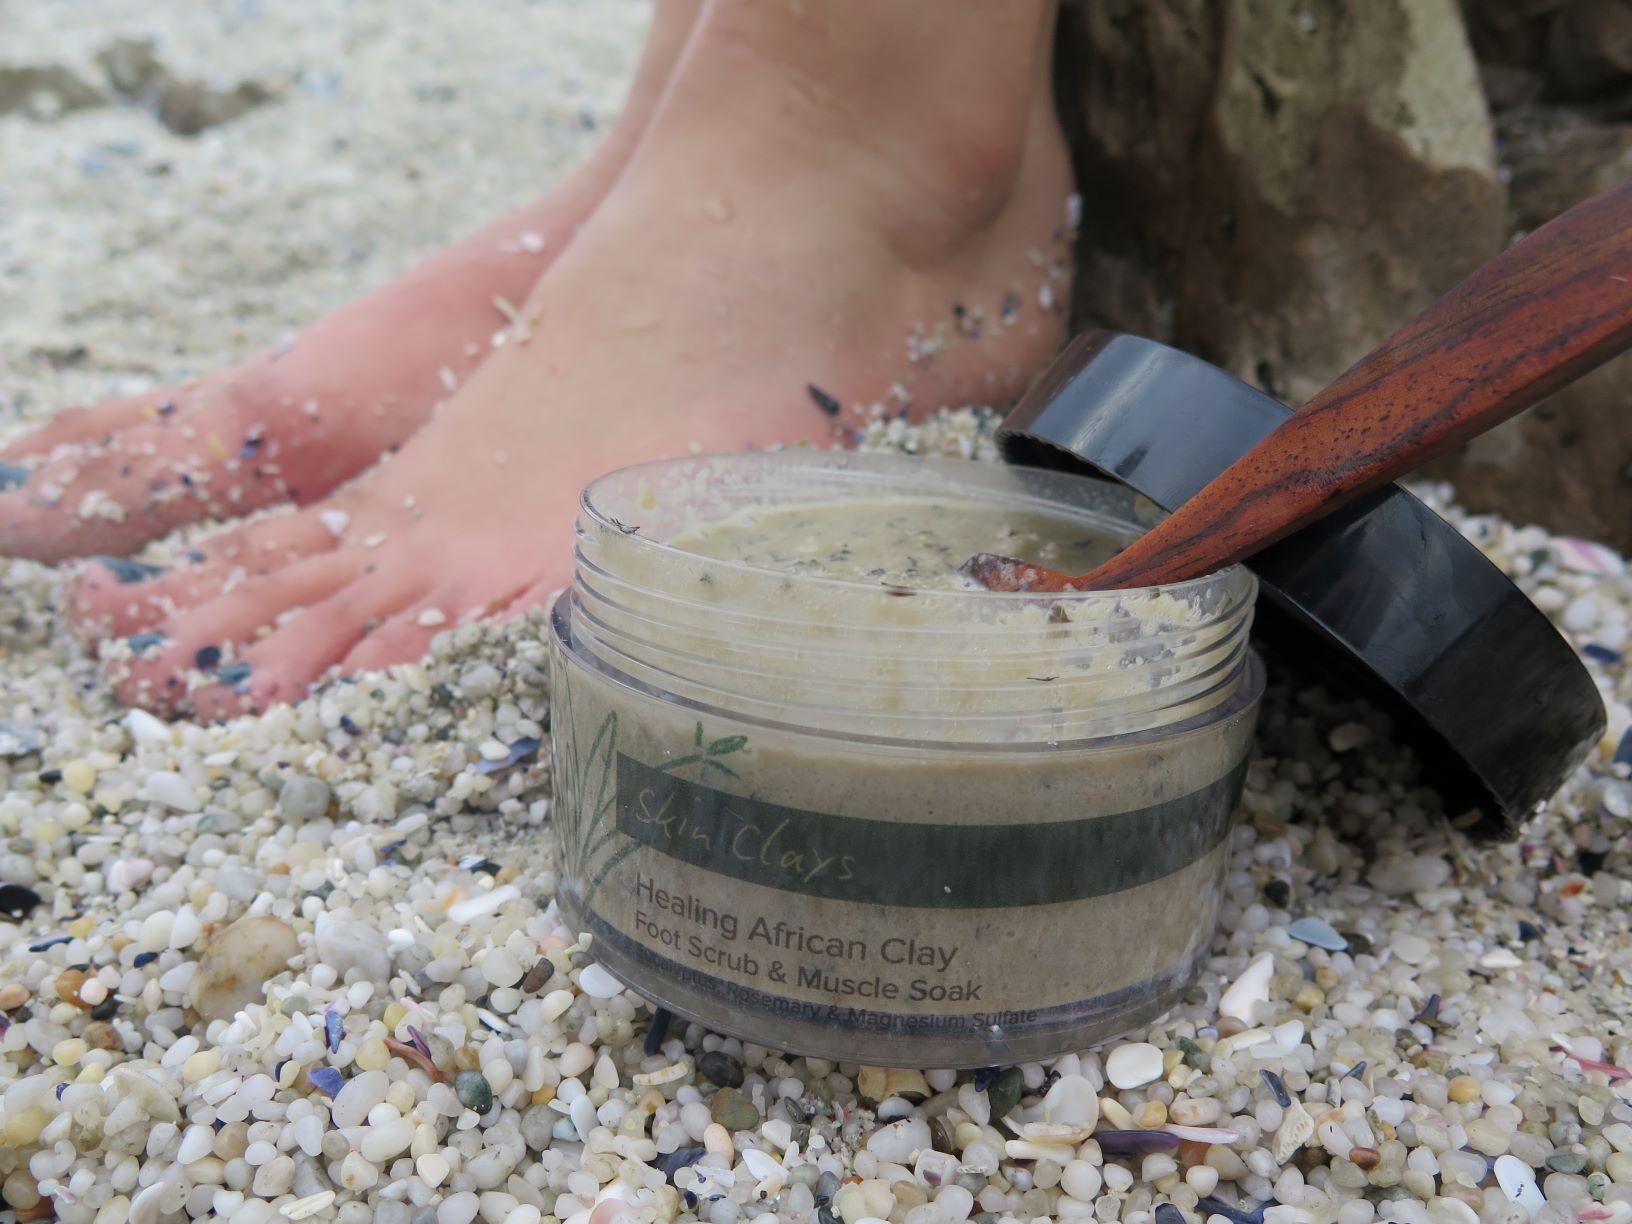 Healing foot scrub